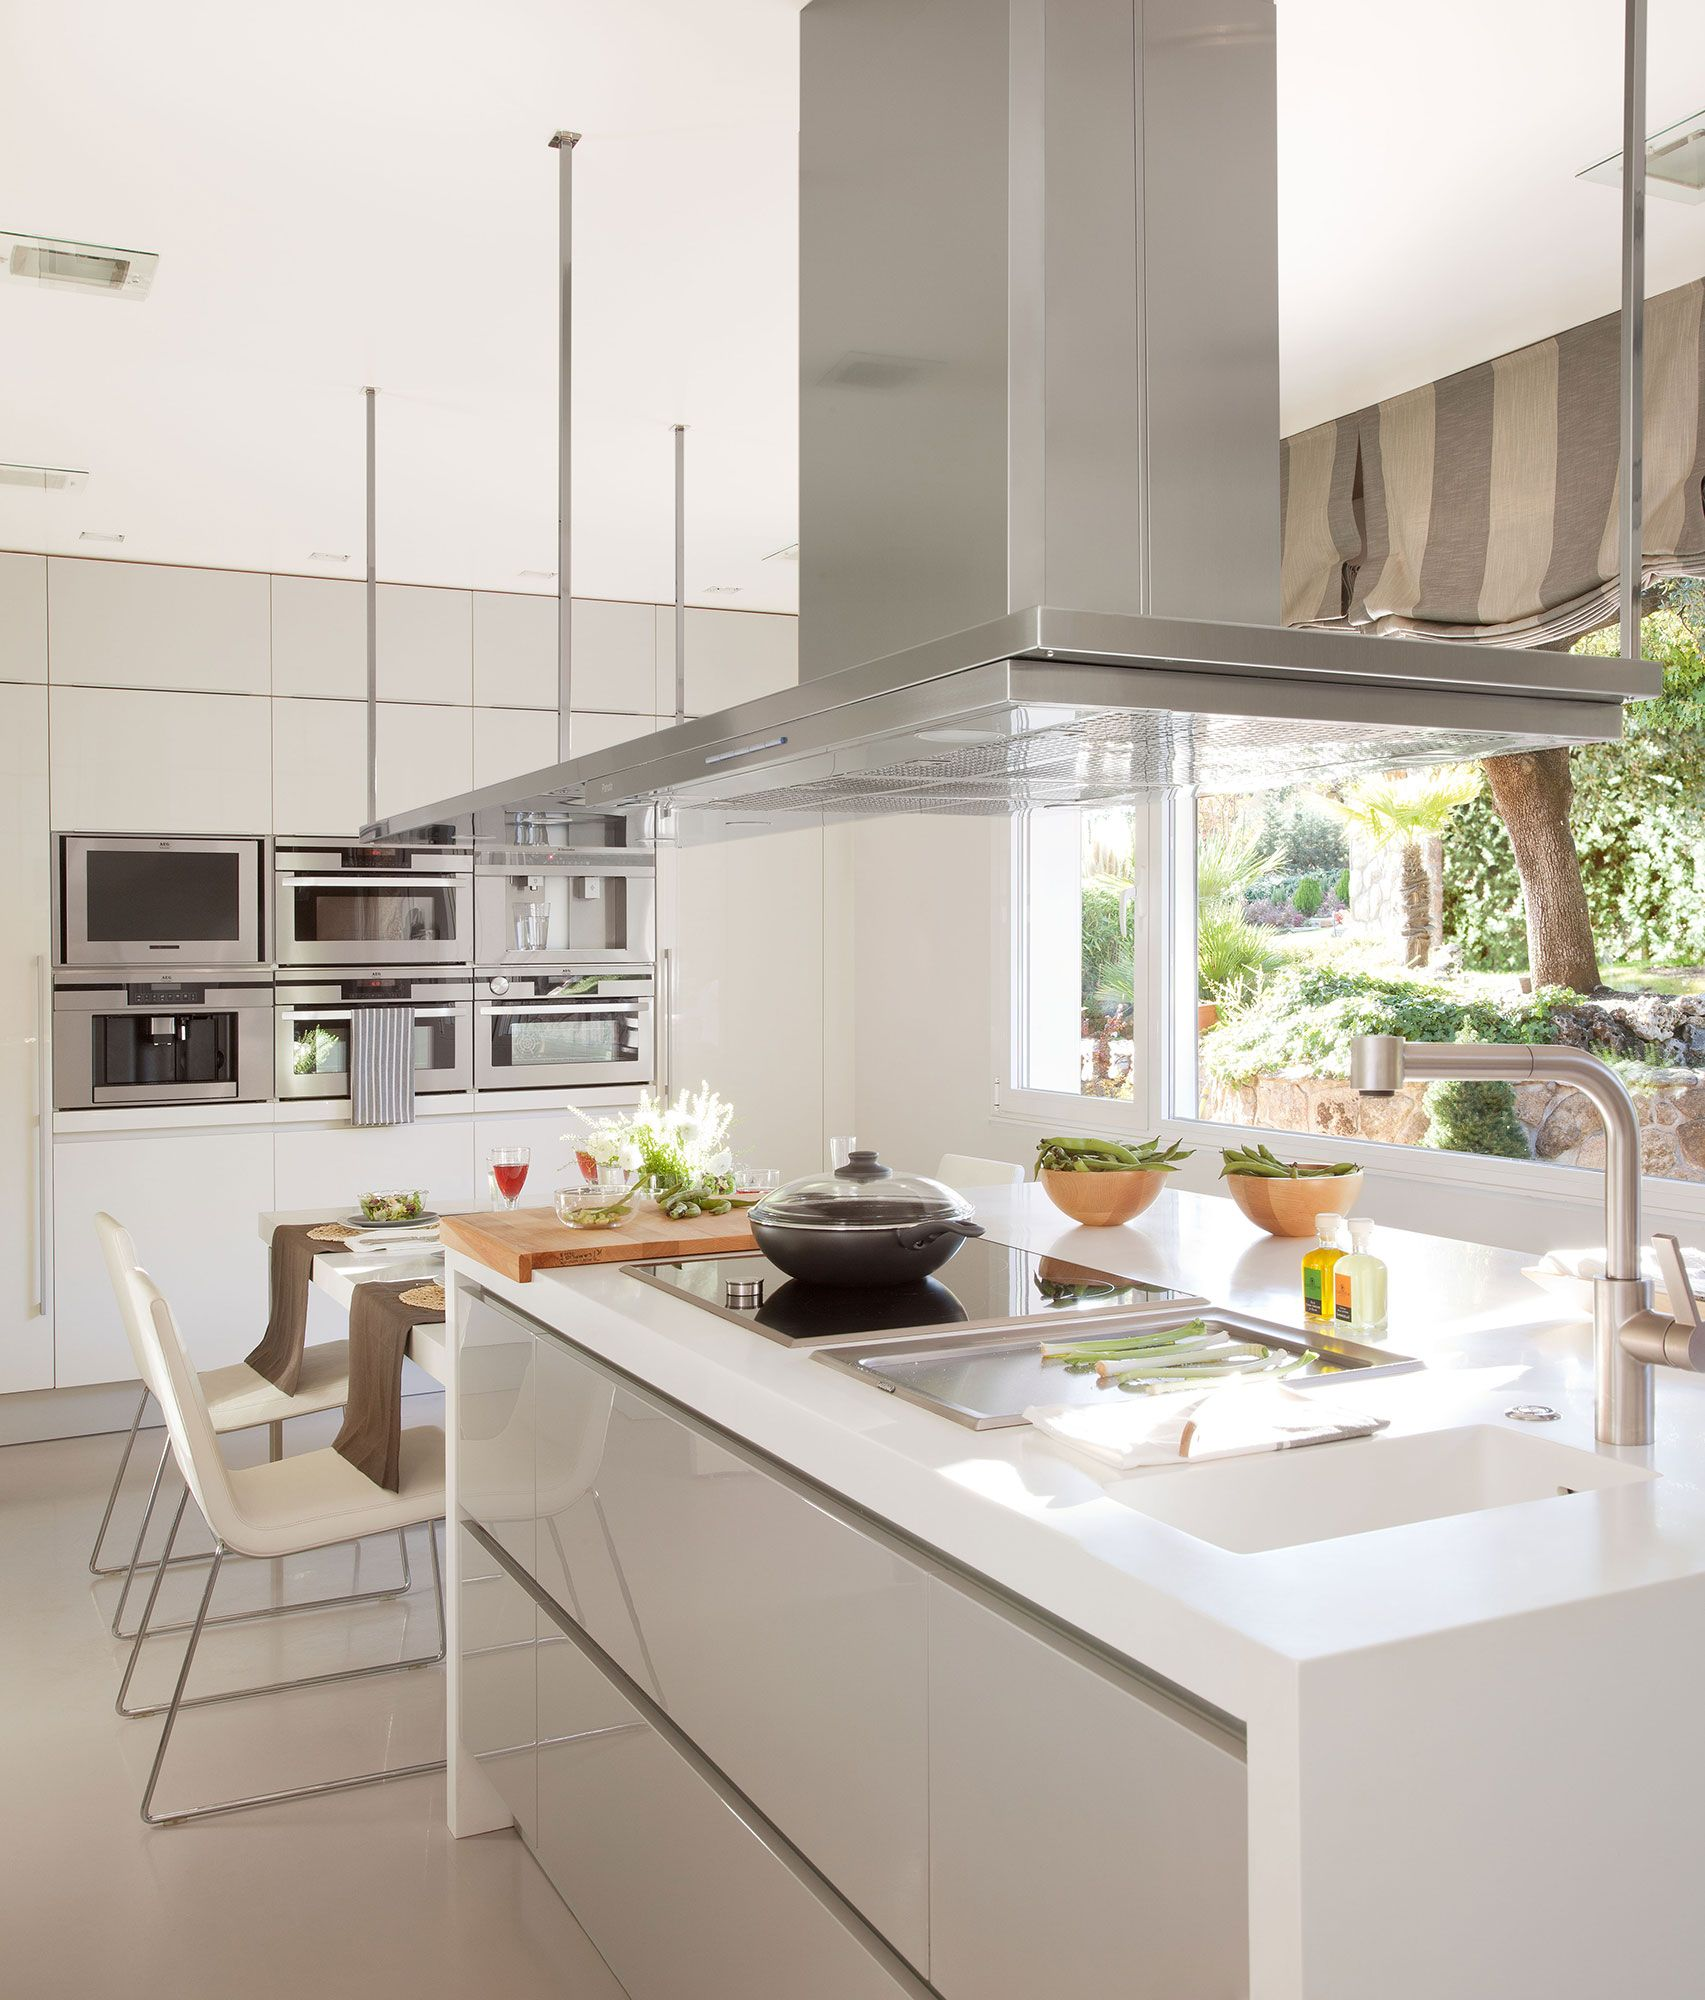 Cocina de dise o moderno con isla en blanco y gris for Isla cocina comedor